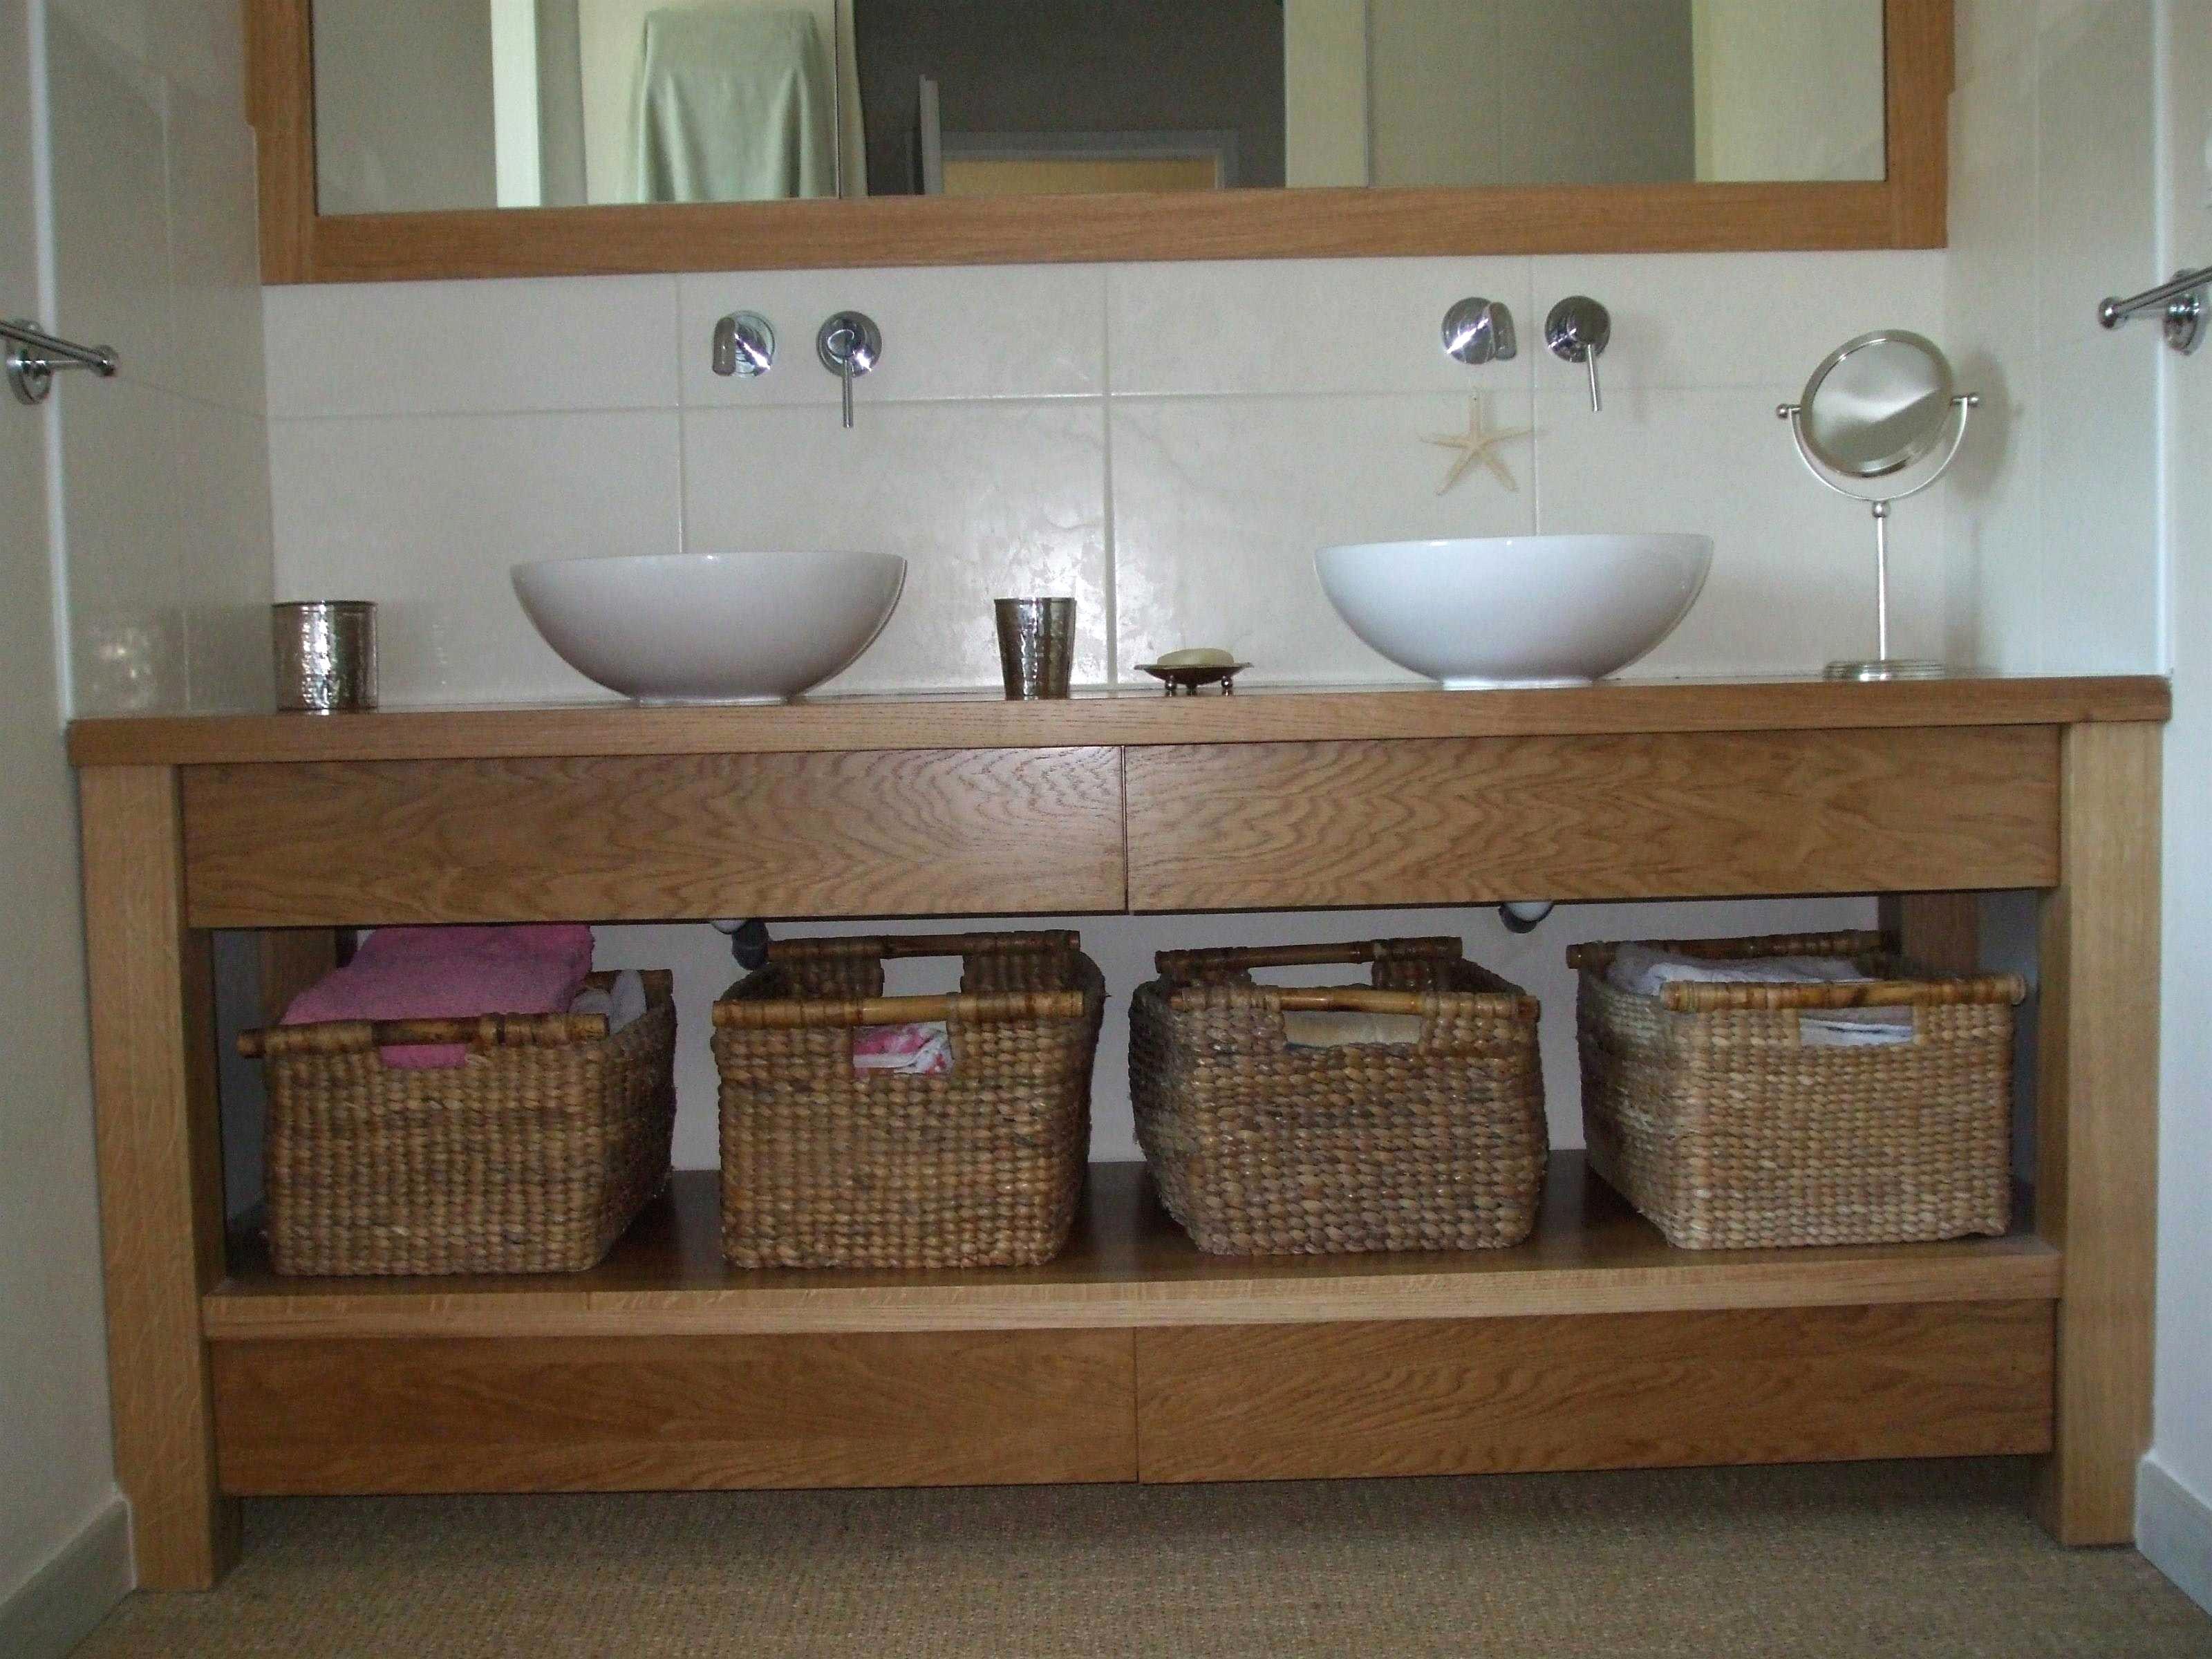 Vasque Encastrable Salle De Bain Ikea Beau Image Ikea Meuble Vasque Salle De Bain Ikea Vasque Salle De Bain Meilleur